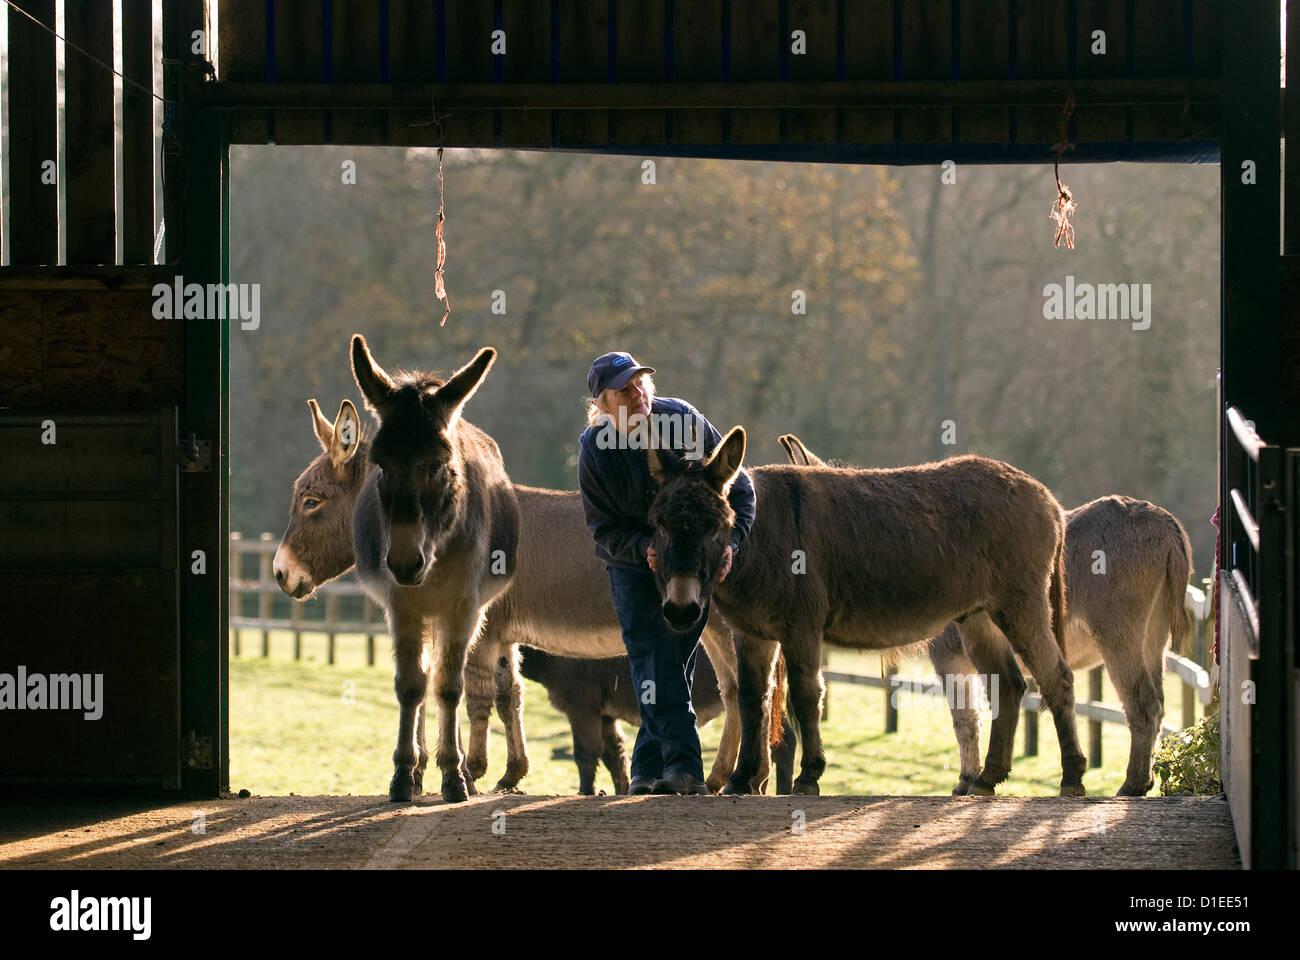 RSPCA worker at a donkey sanctuary, Surrey, UK. - Stock Image